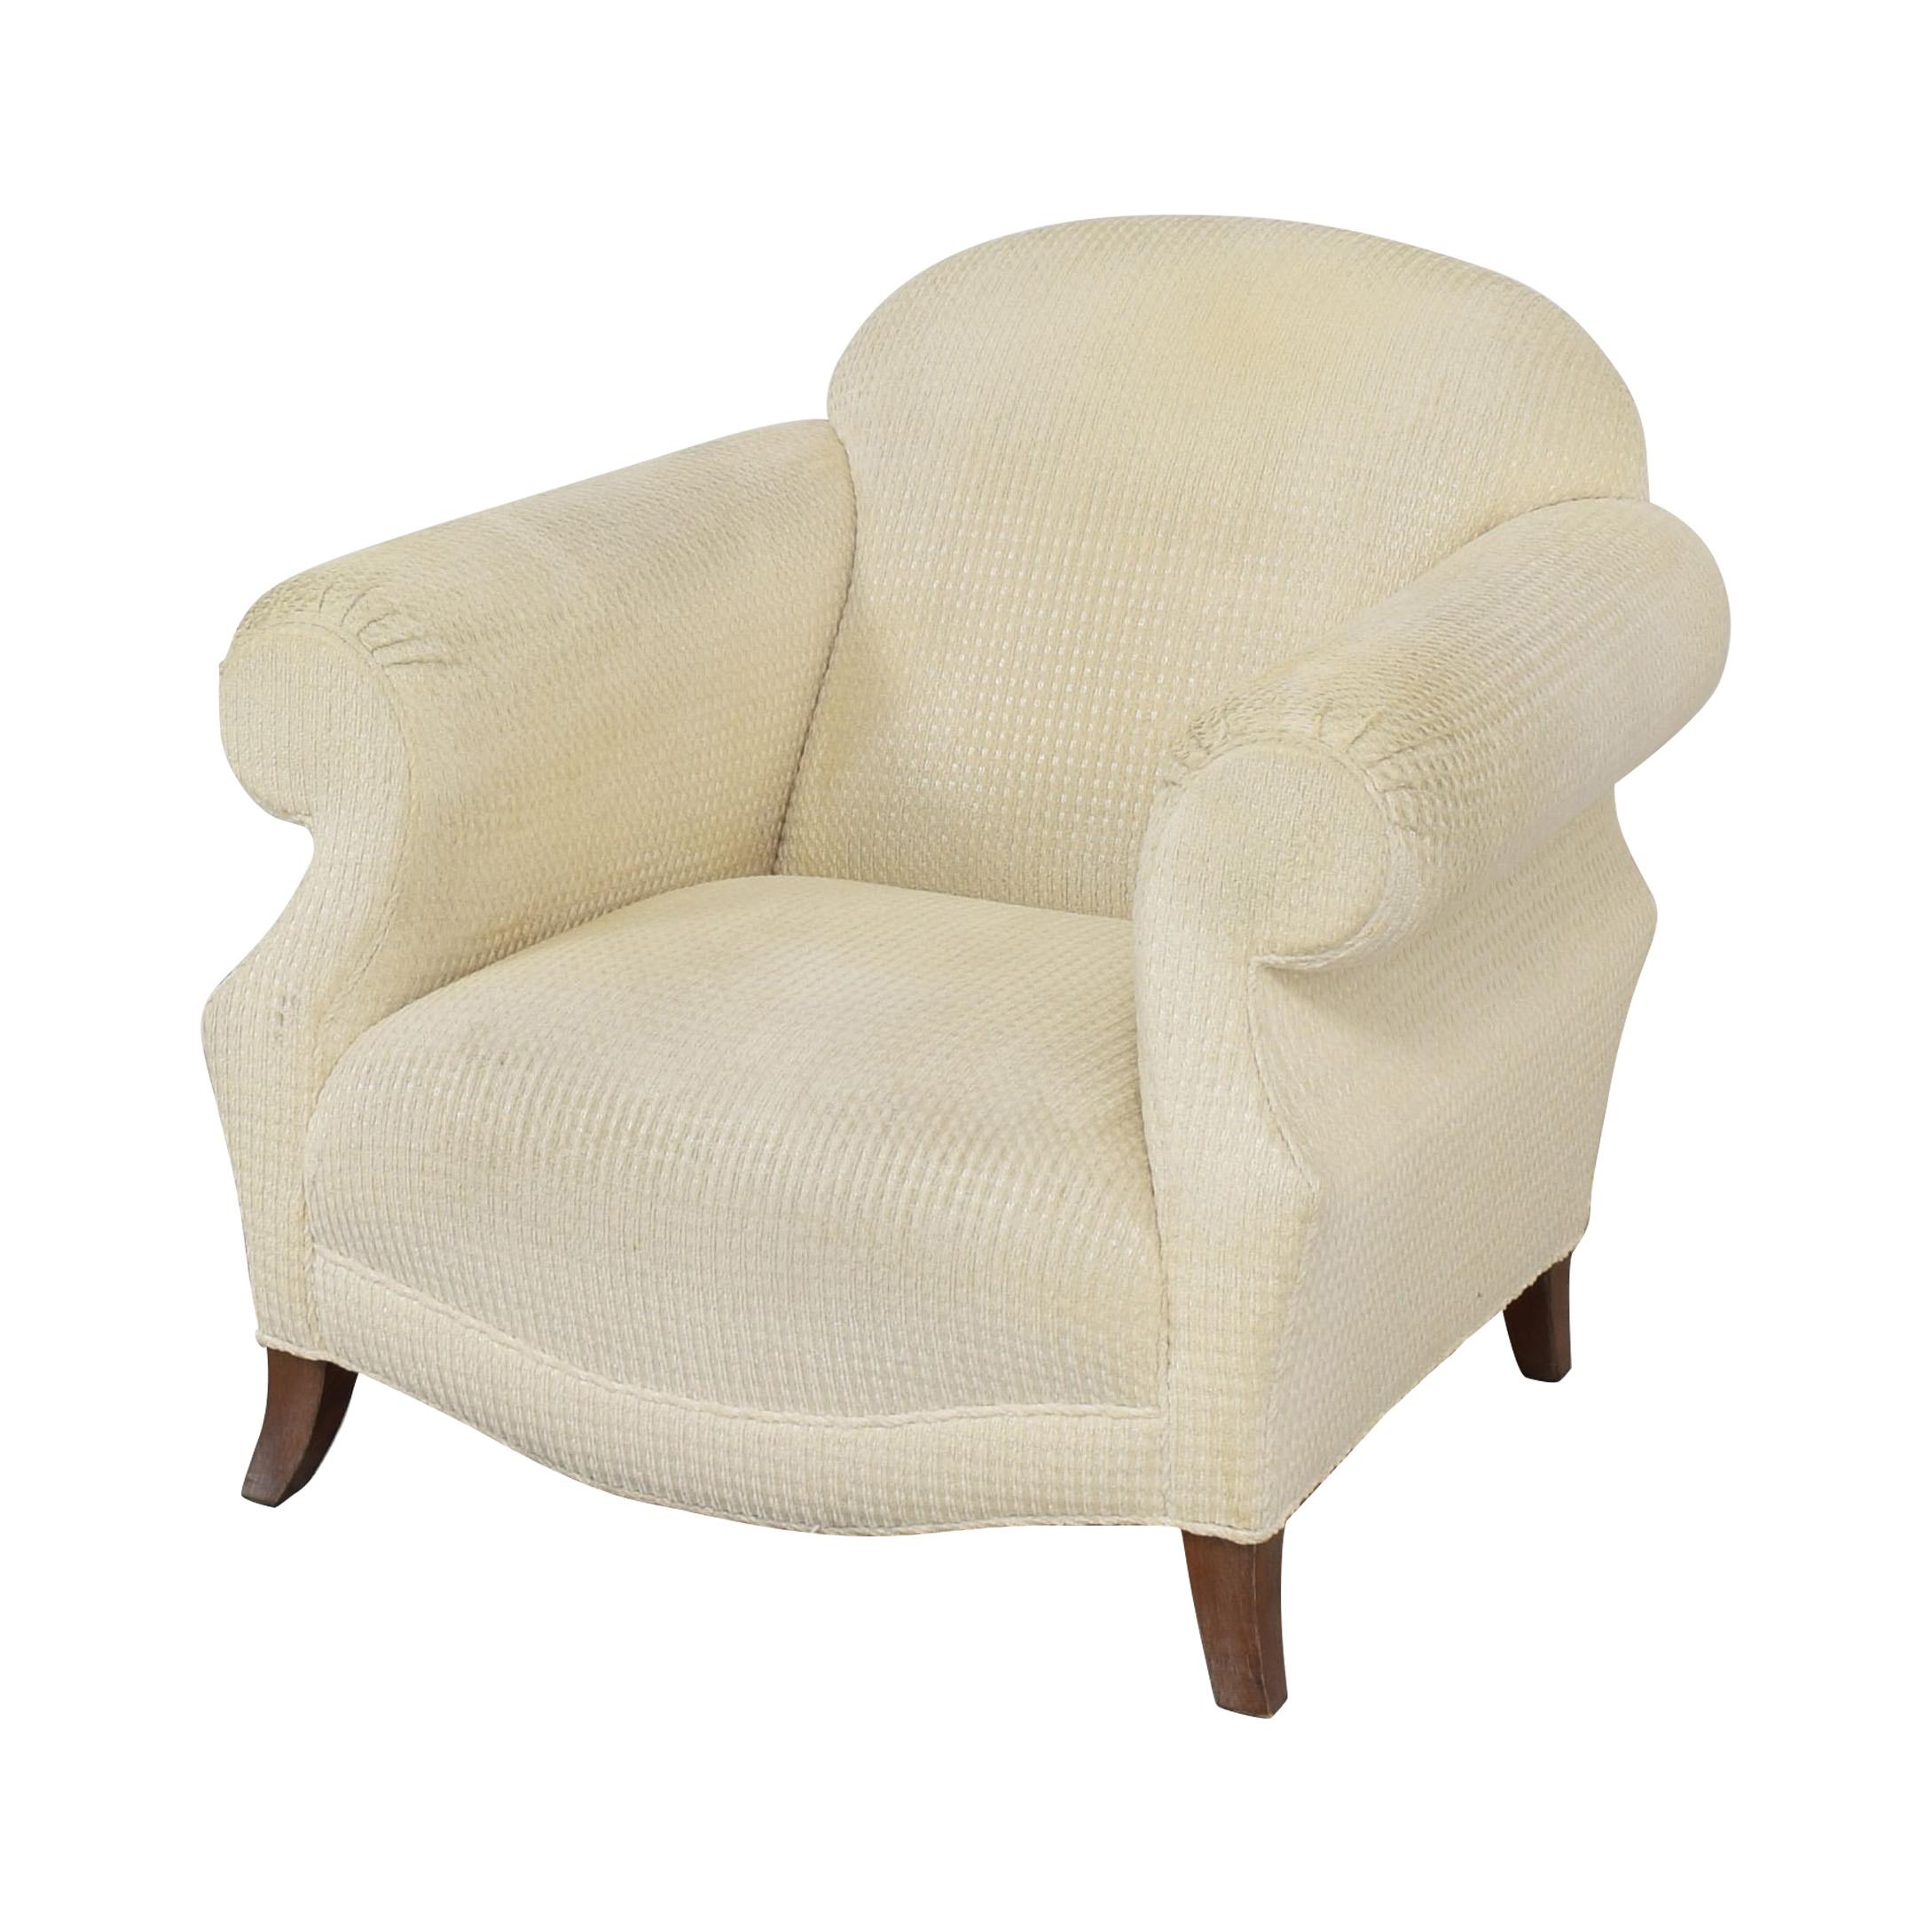 Swaim Swaim Accent Chair nj